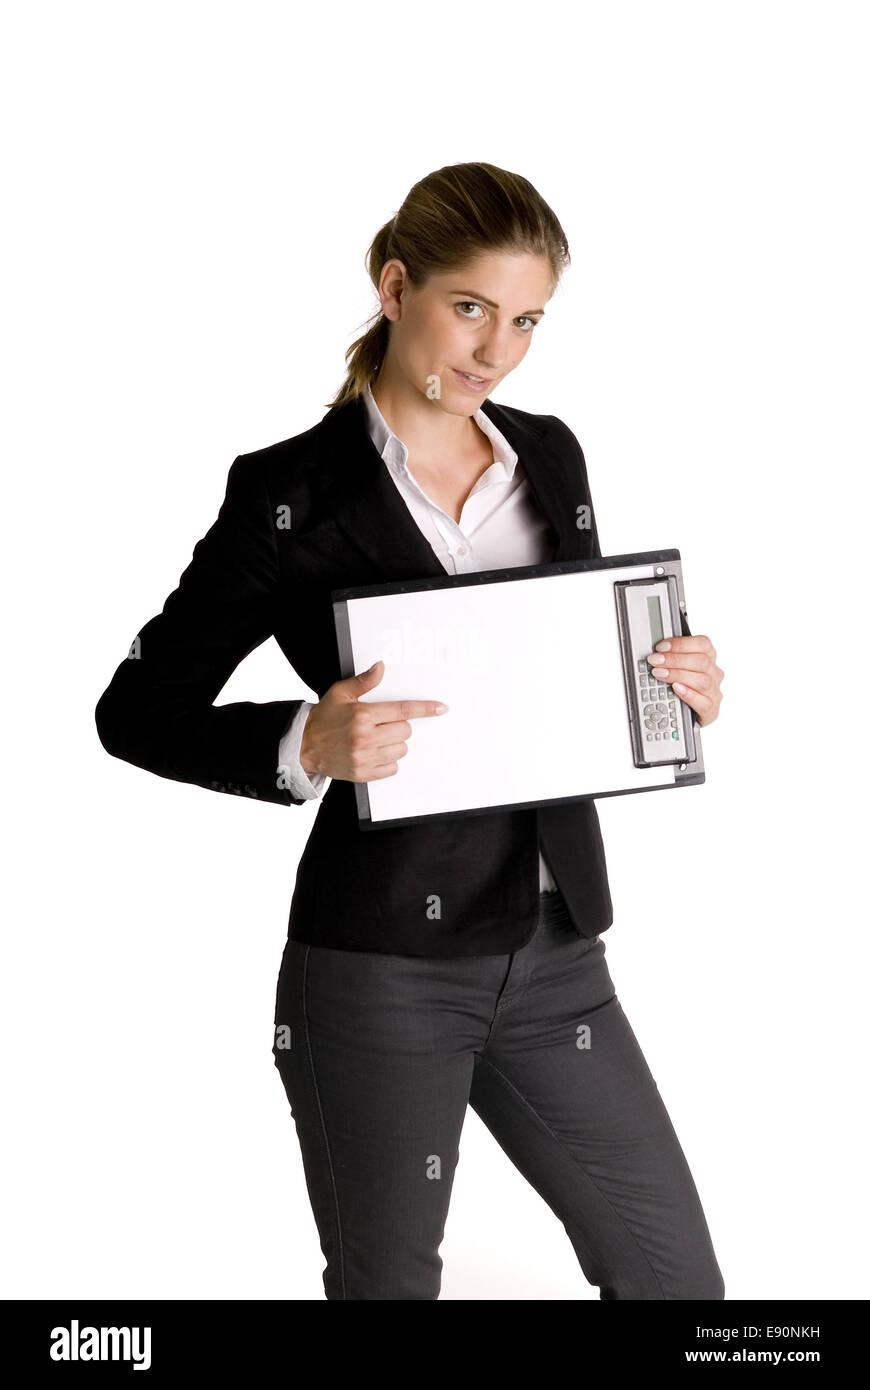 Young Secretary - Stock Image